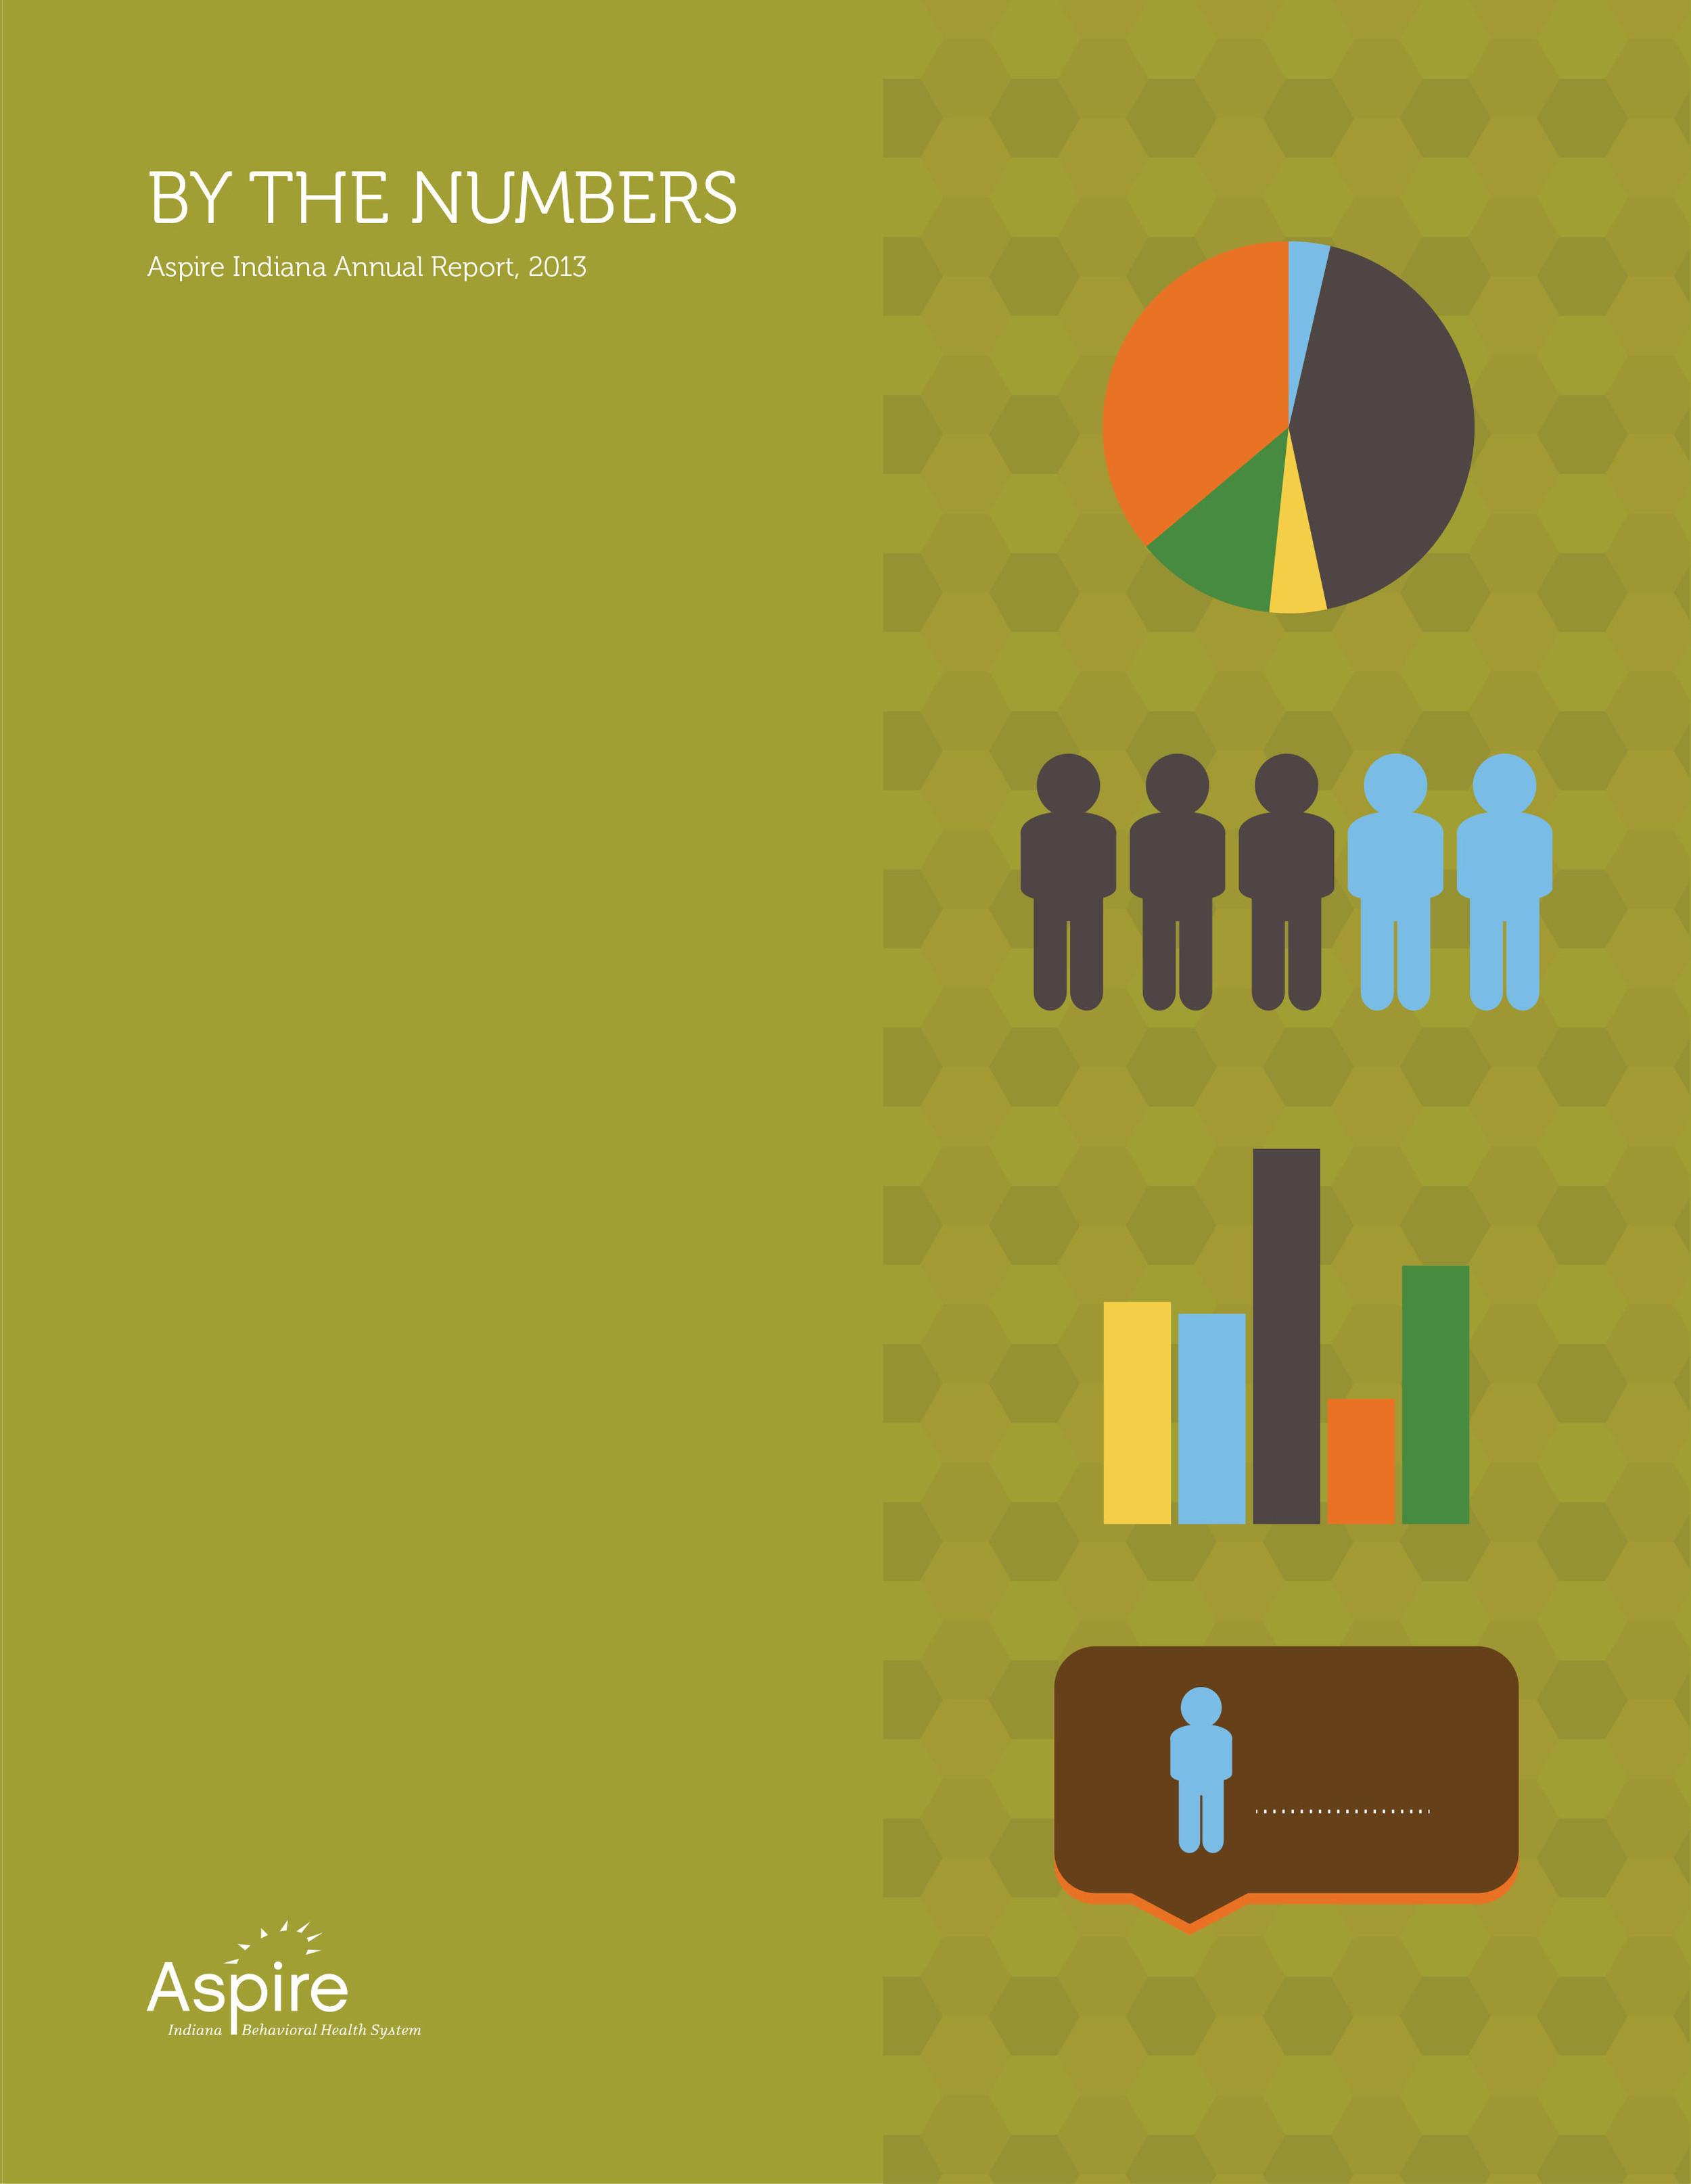 Aspire Indiana Annual Report 2013